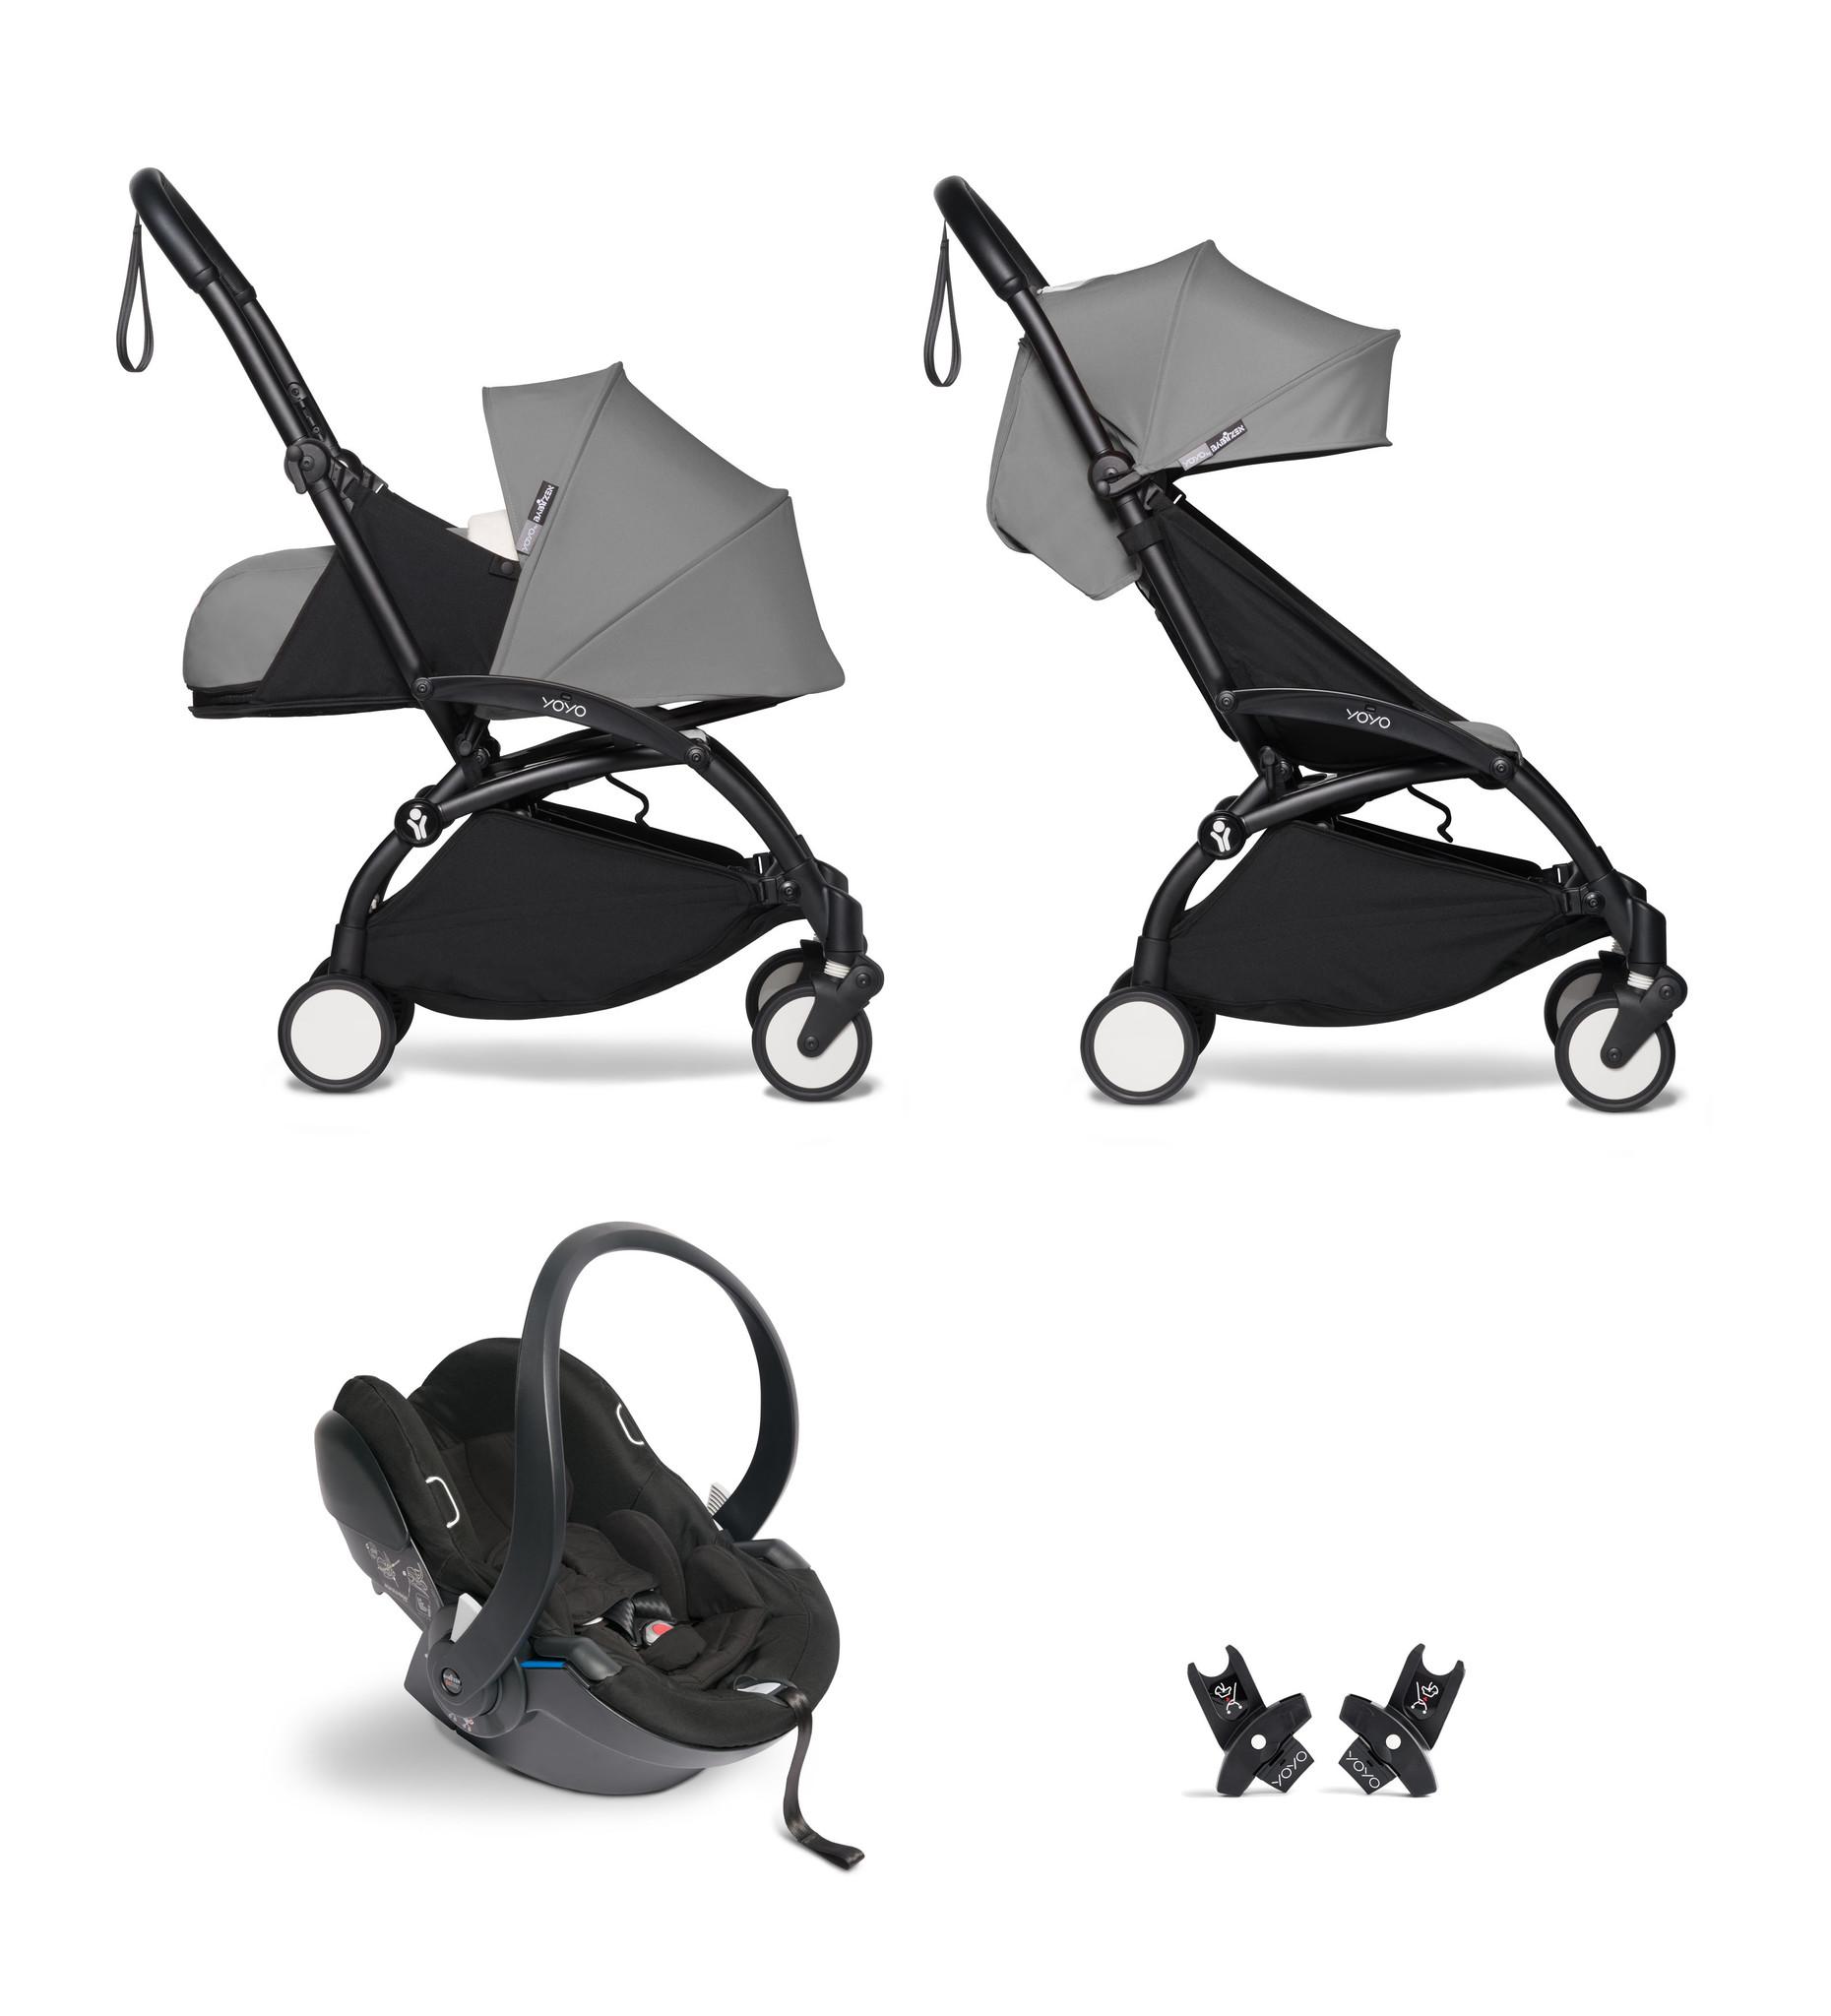 Babyzen YOYO² buggy COMPLEET / FULL SET 0+ and 6+ grijs frame zwart incl. YOYO² BeSafe autostoel zwa